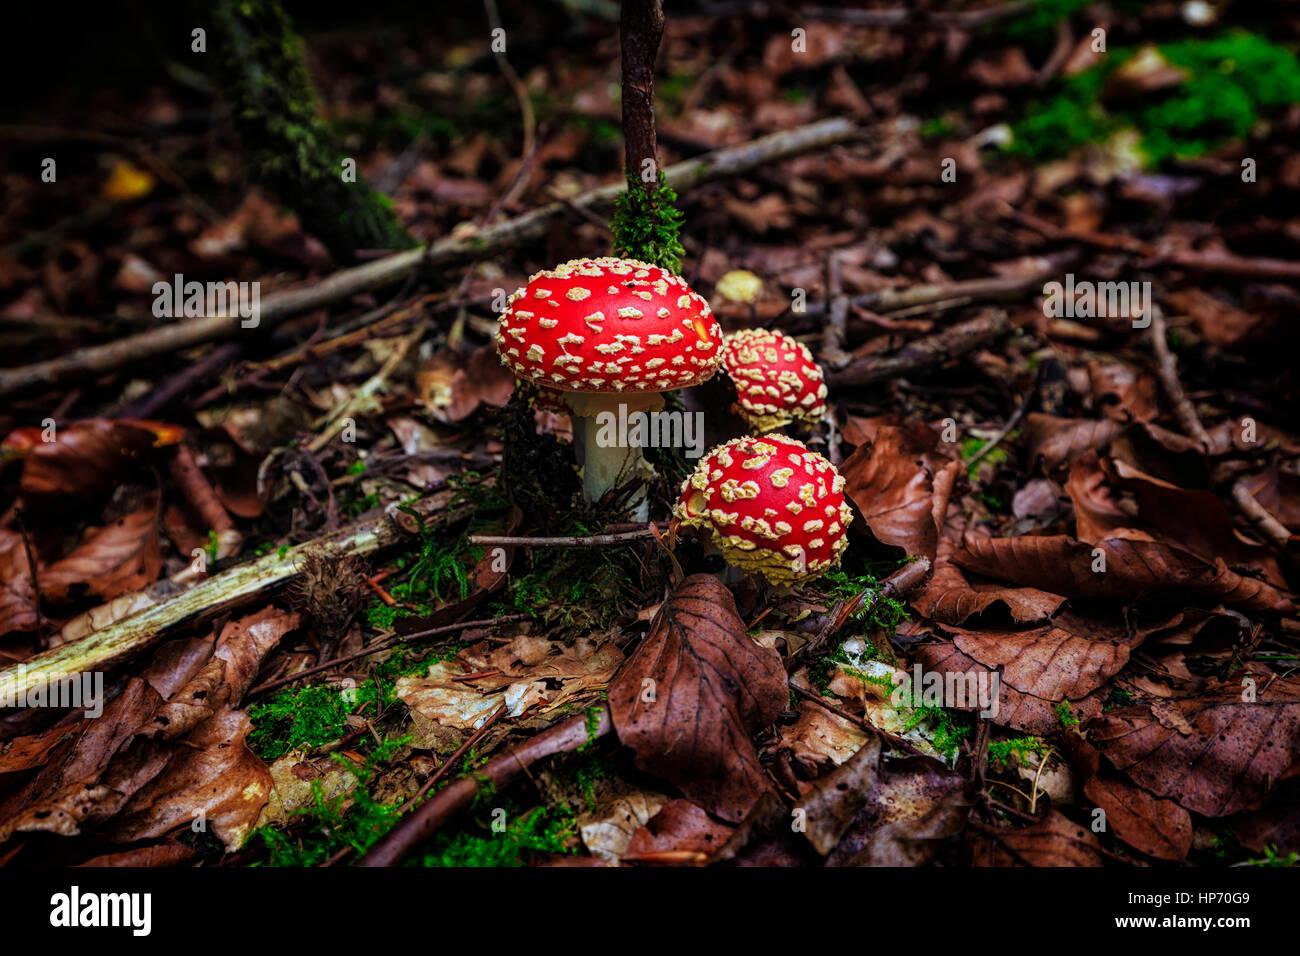 Amanita Pilz In den Thüringer Wald, Deutschland Stockbild